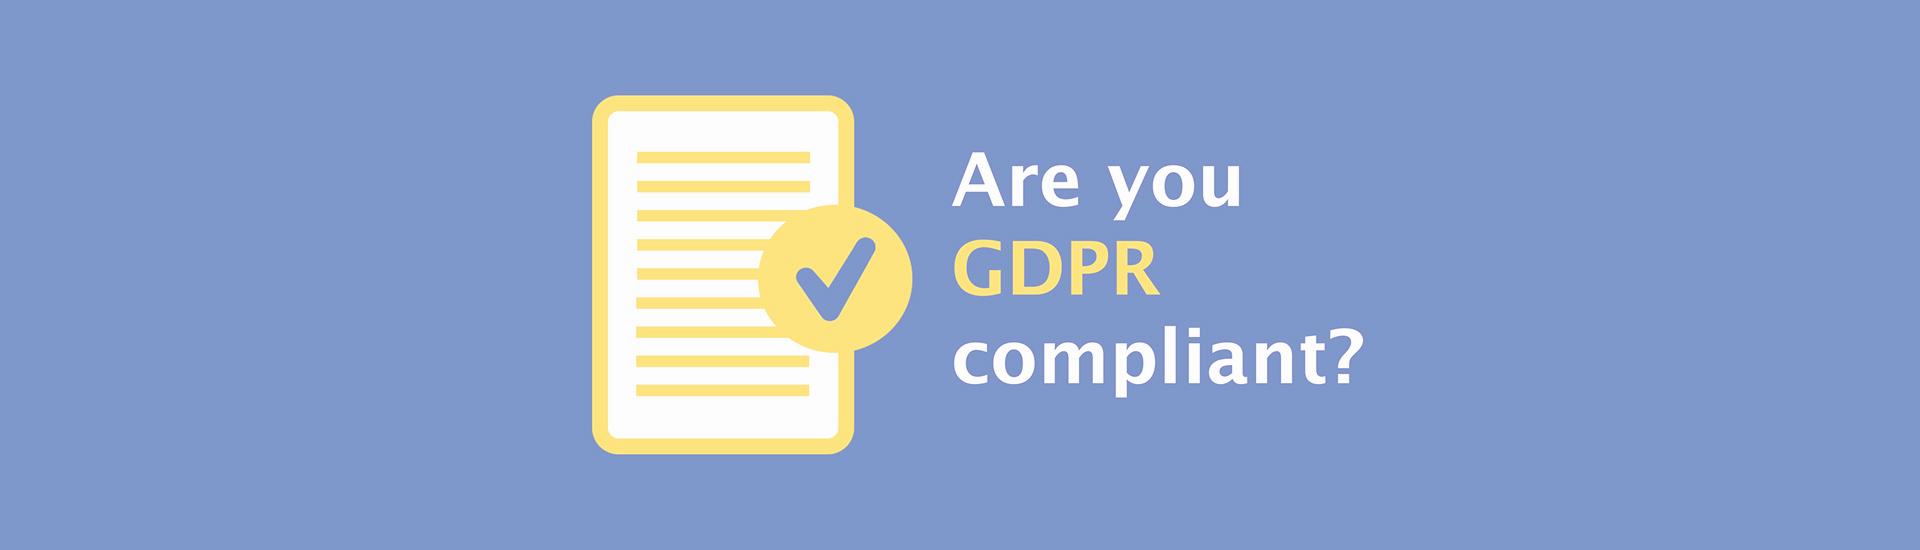 GDPR: 5 πράγματα που πρέπει να γνωρίζετε για τον νέο κανονισμό προστασίας δεδομένων της Ευρωπαϊκής Ένωσης που θα τεθεί σε ισχύ από 25/5/2018